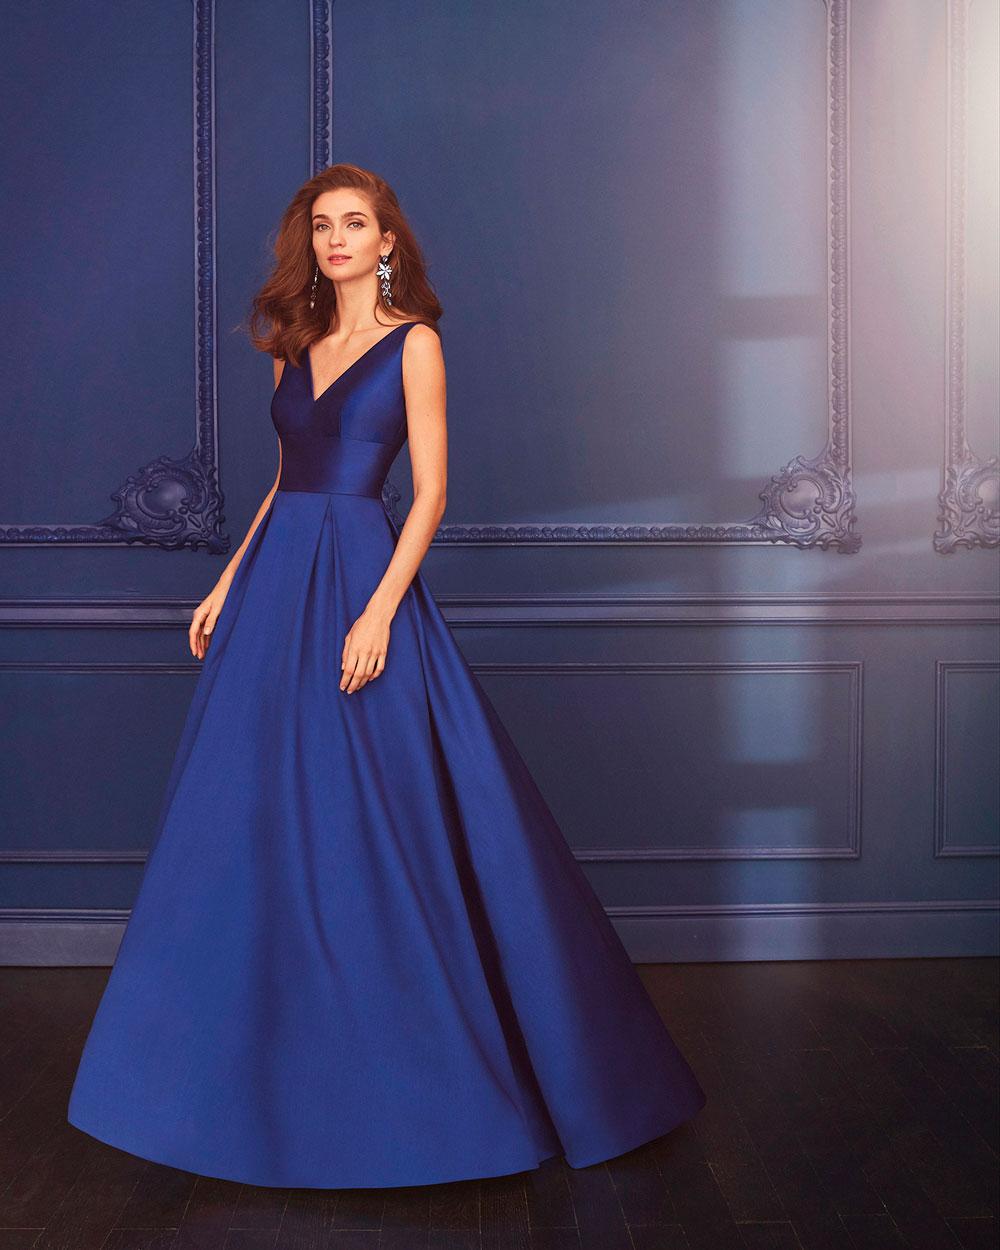 vestido de fiesta 2020 4J1A7 MARFIL BARCELONA 3